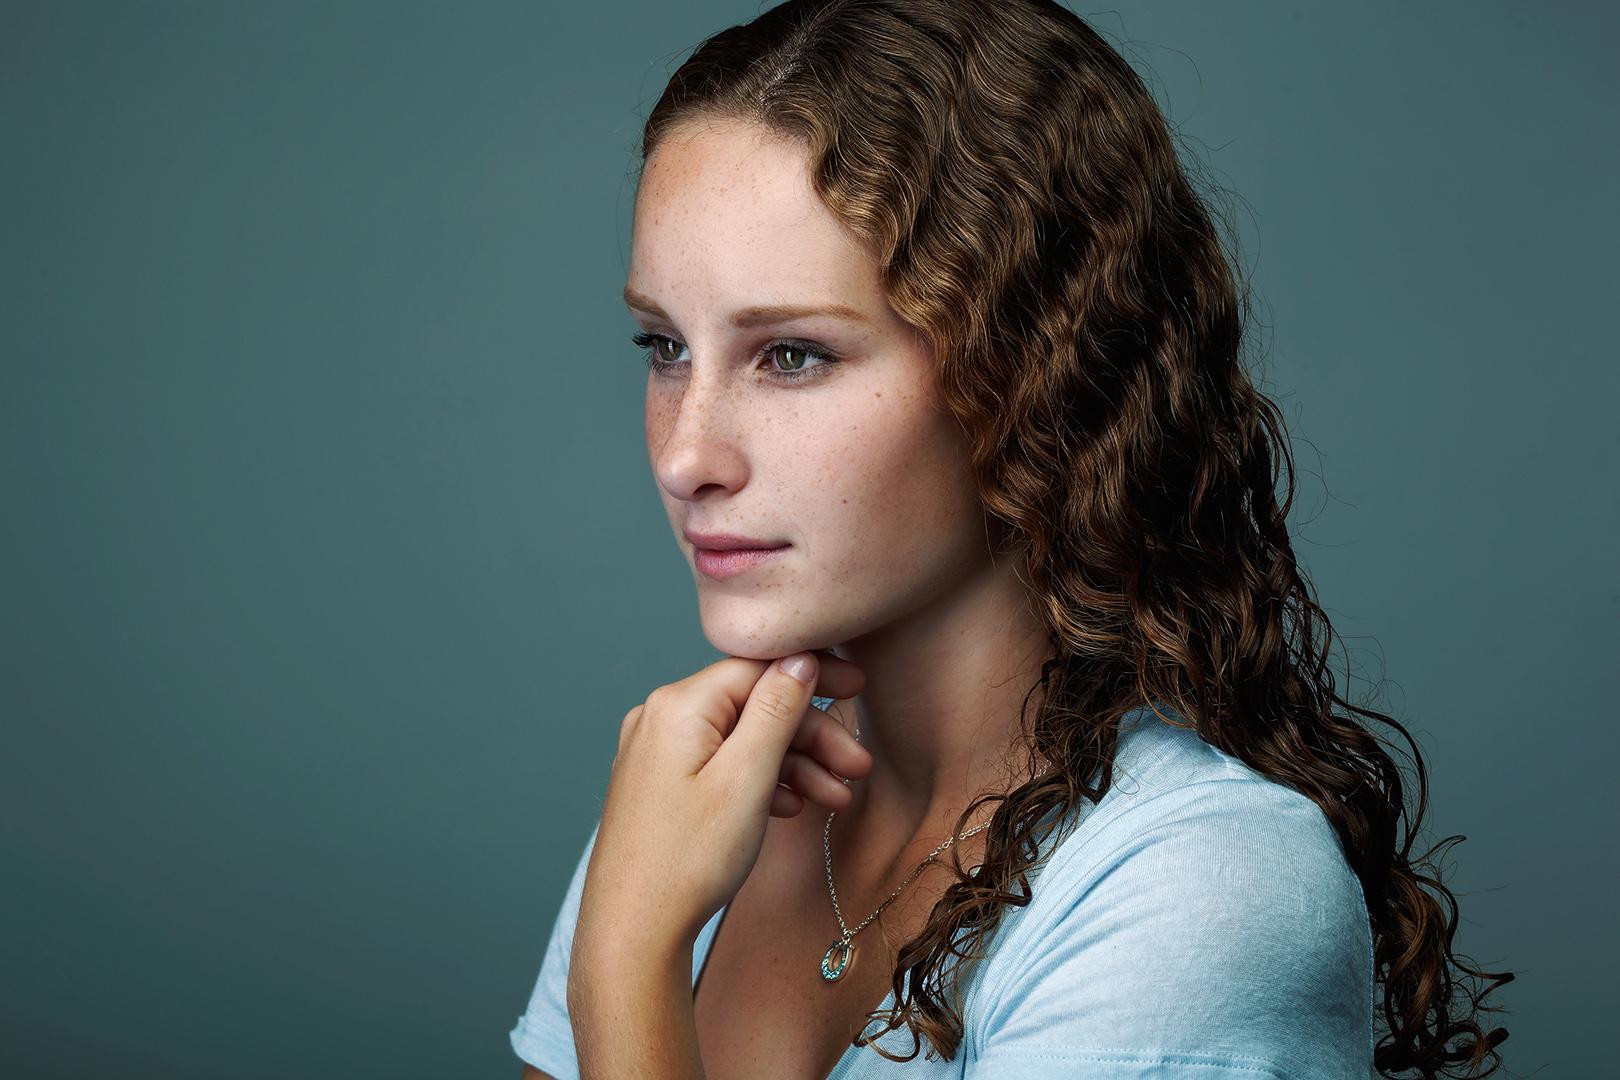 Windsor Portrait Photographer - Studio Portrait